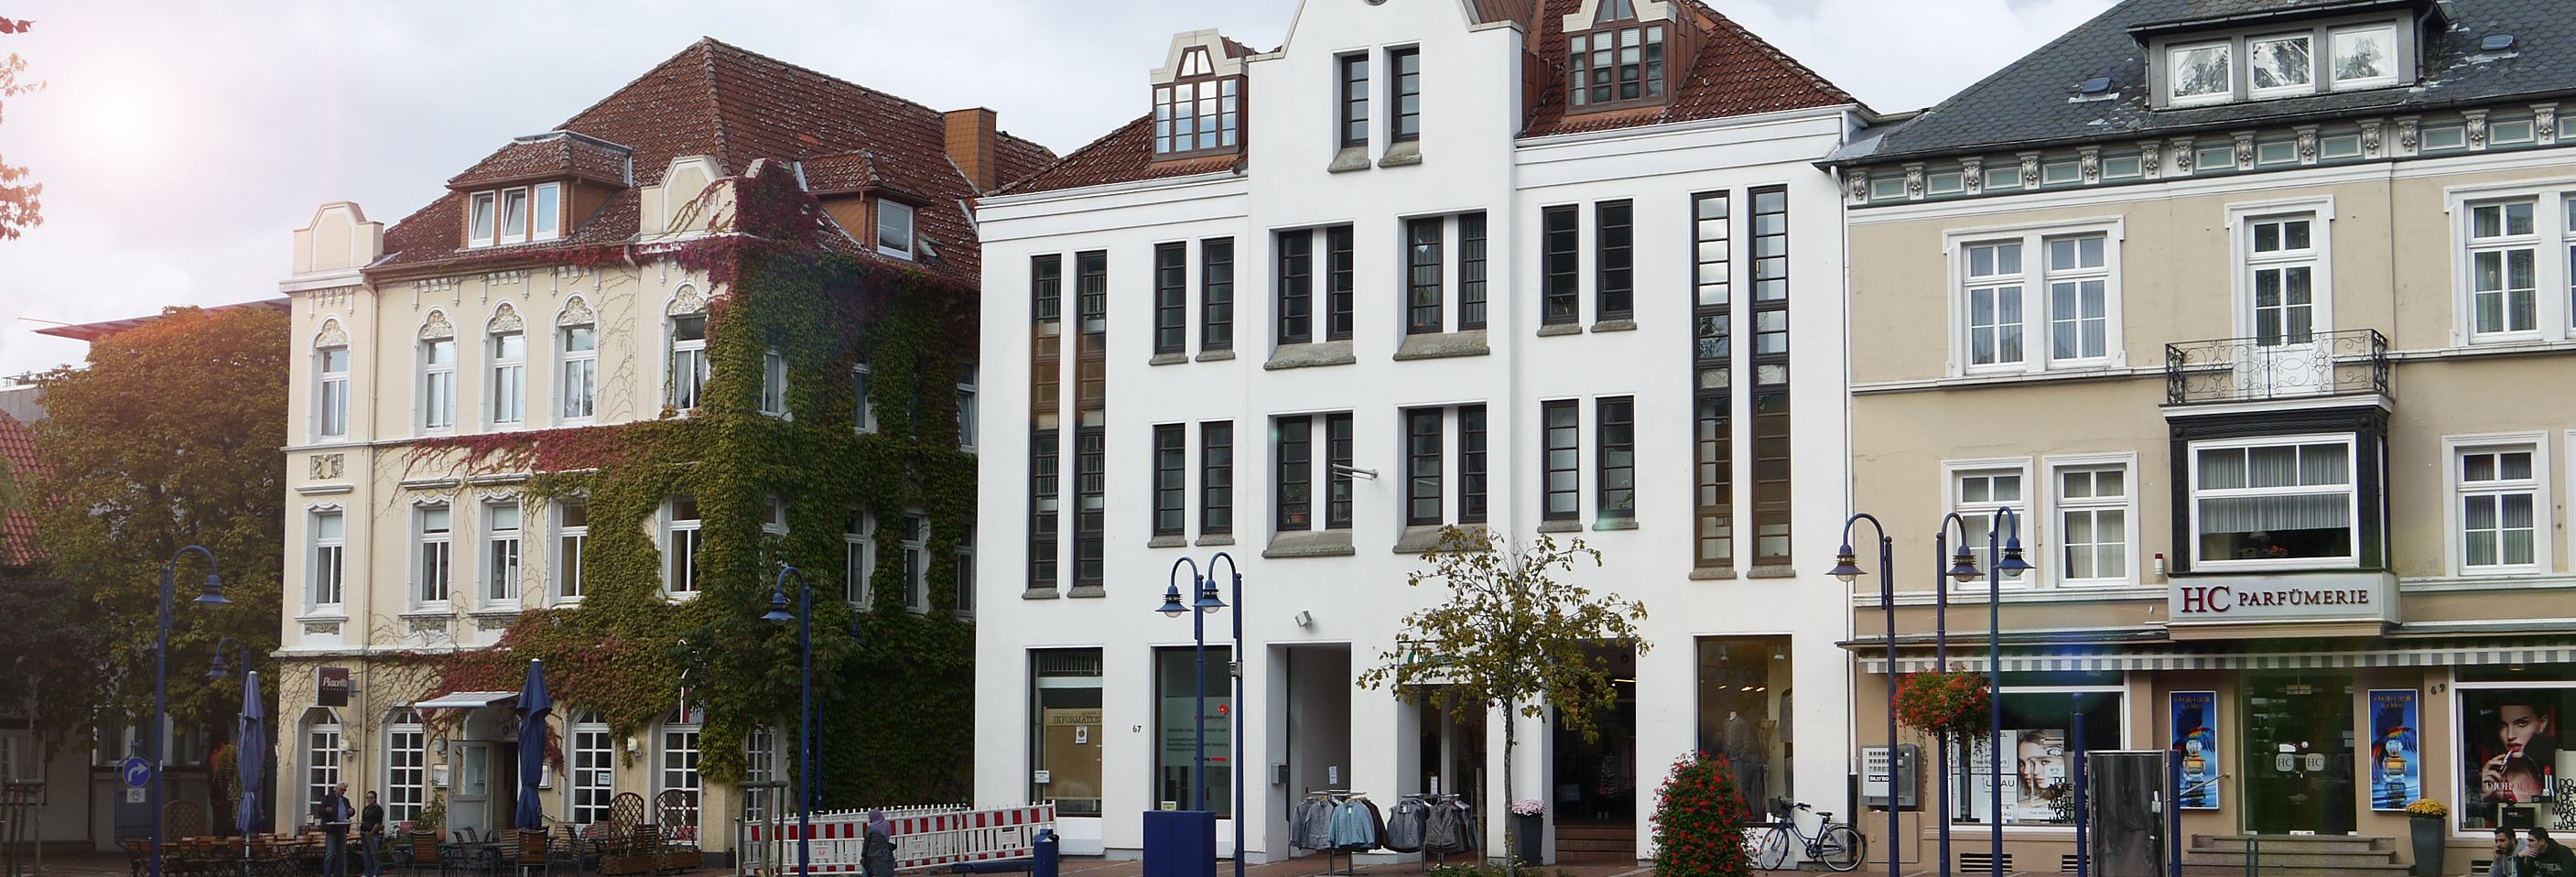 Rathaus 3 . Lage